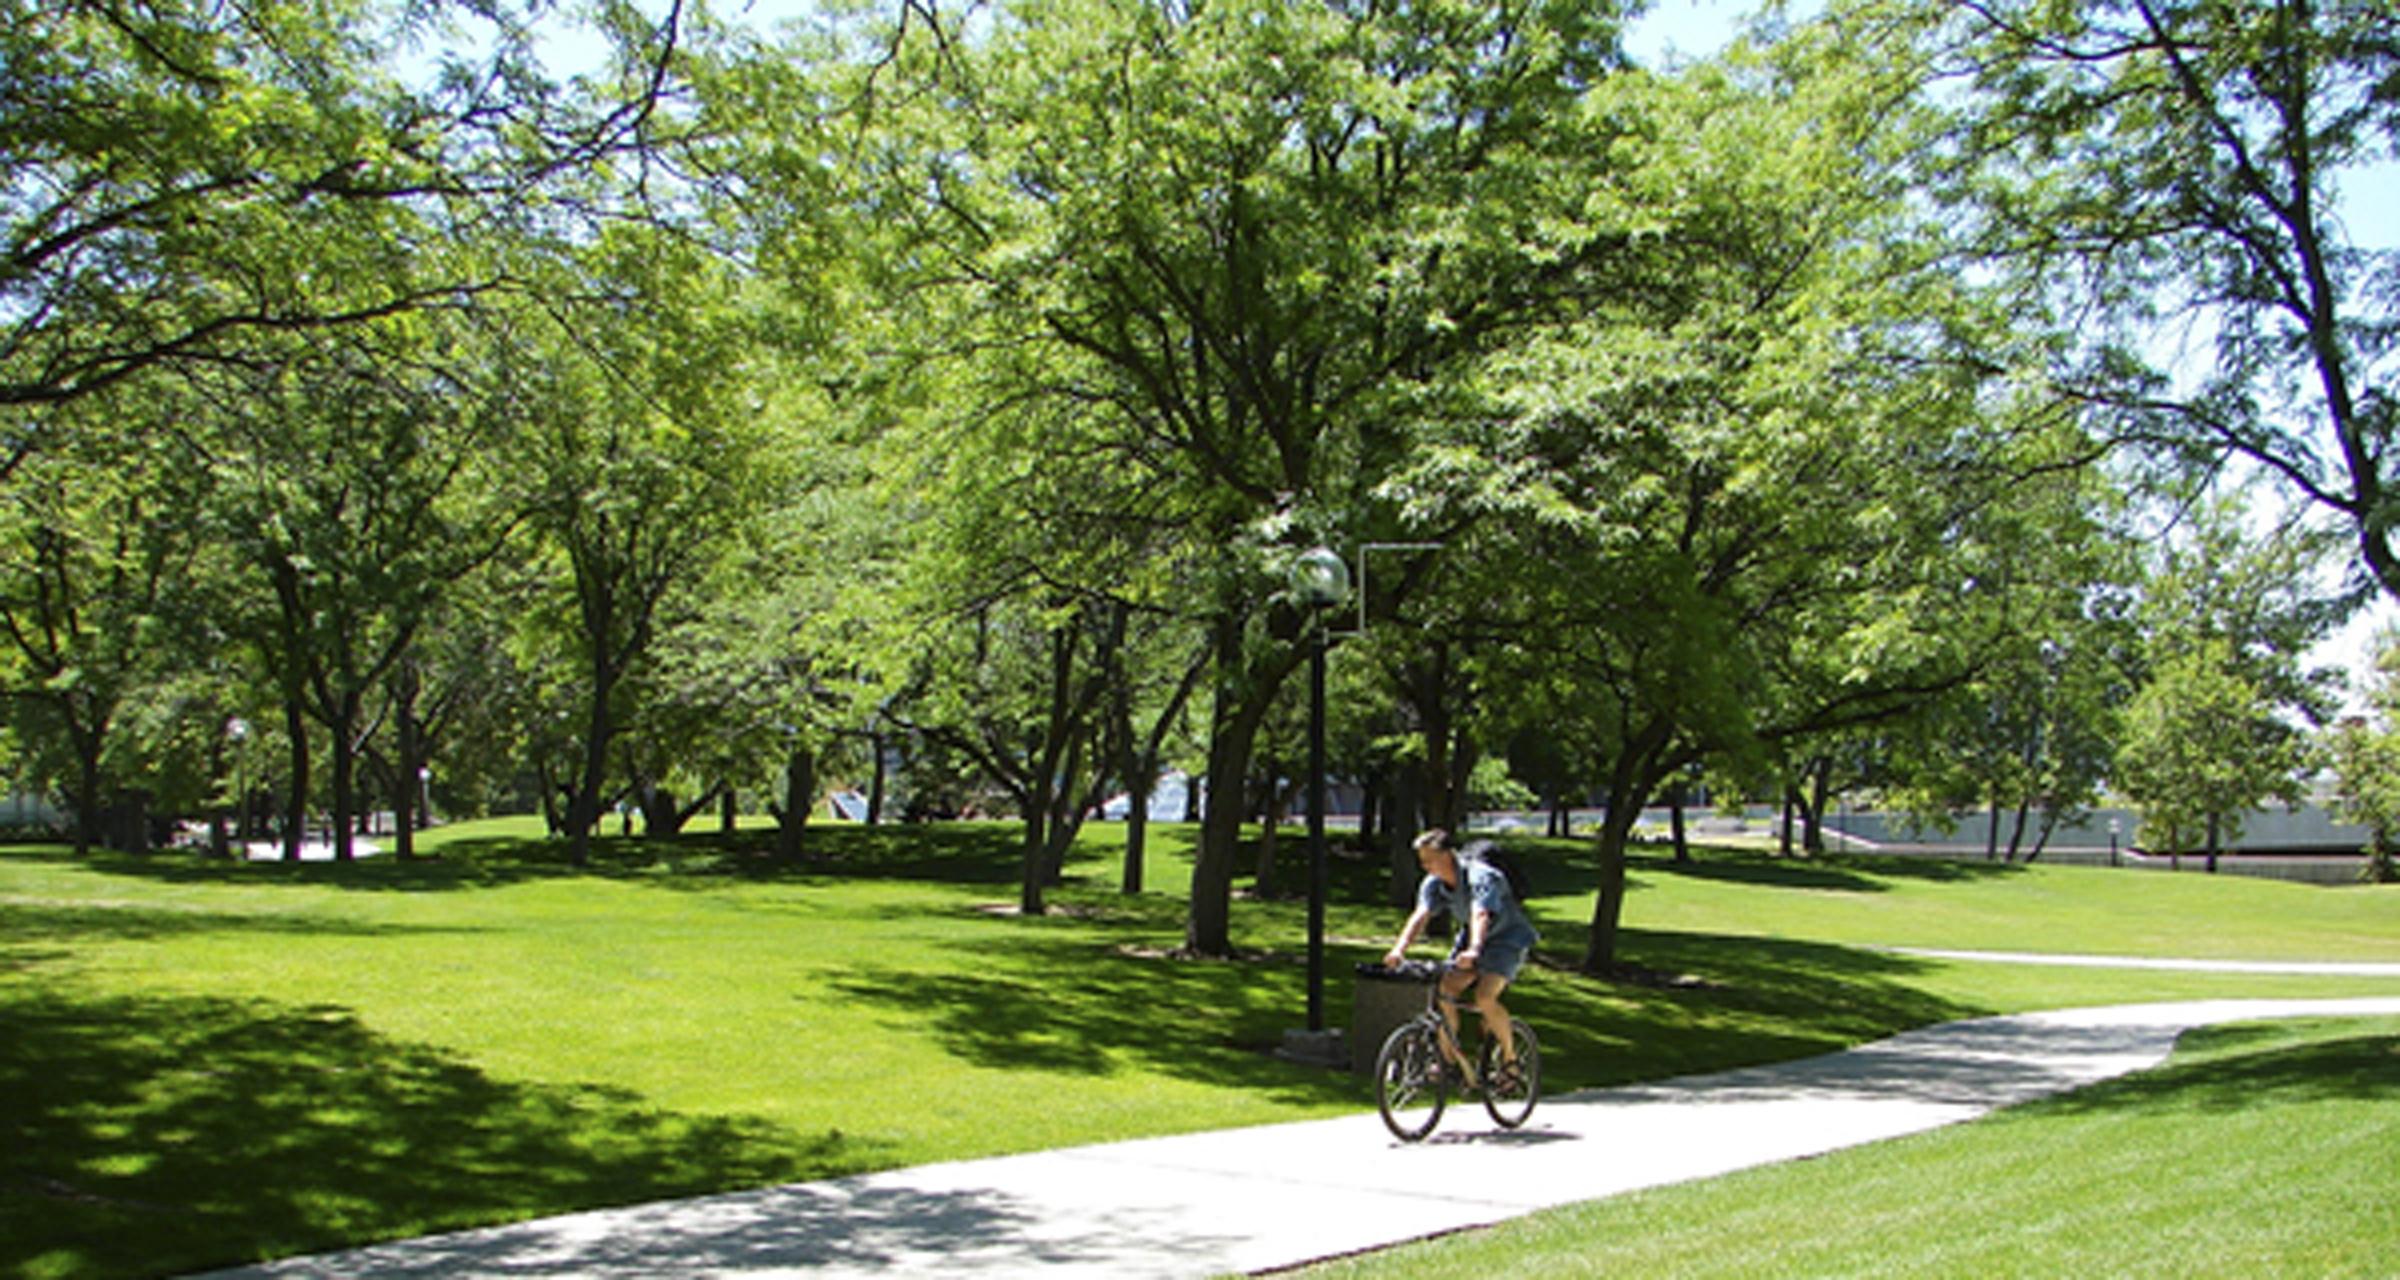 Cyclist at the University of Utah.